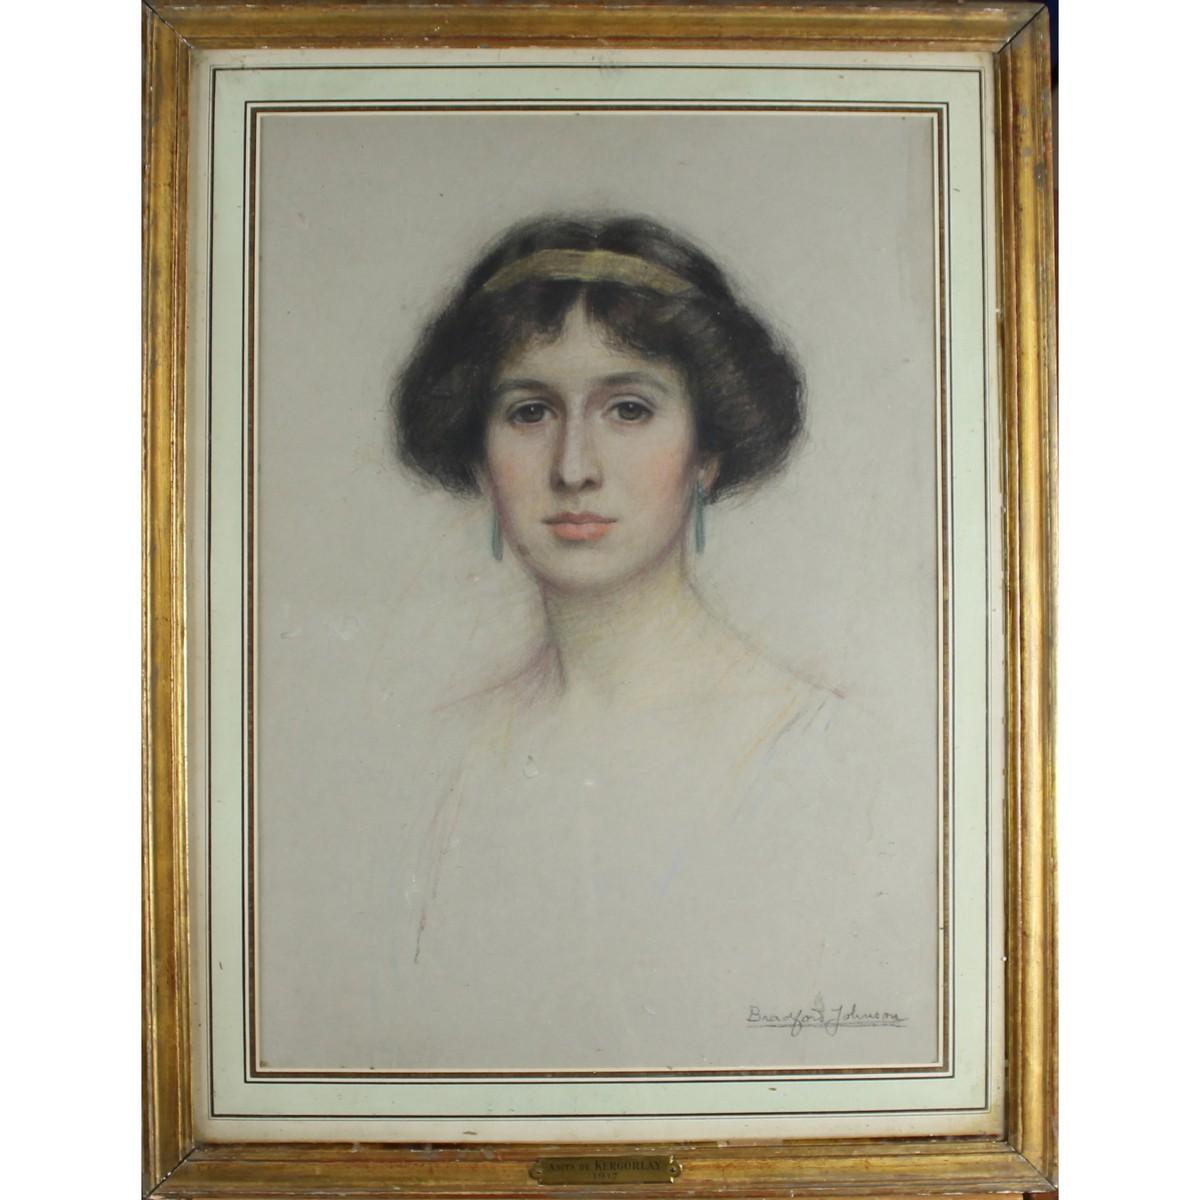 Lot 21 - Johnson, Bradford Nineteenth-Twentieth Century, British, Portrait of a Lady.